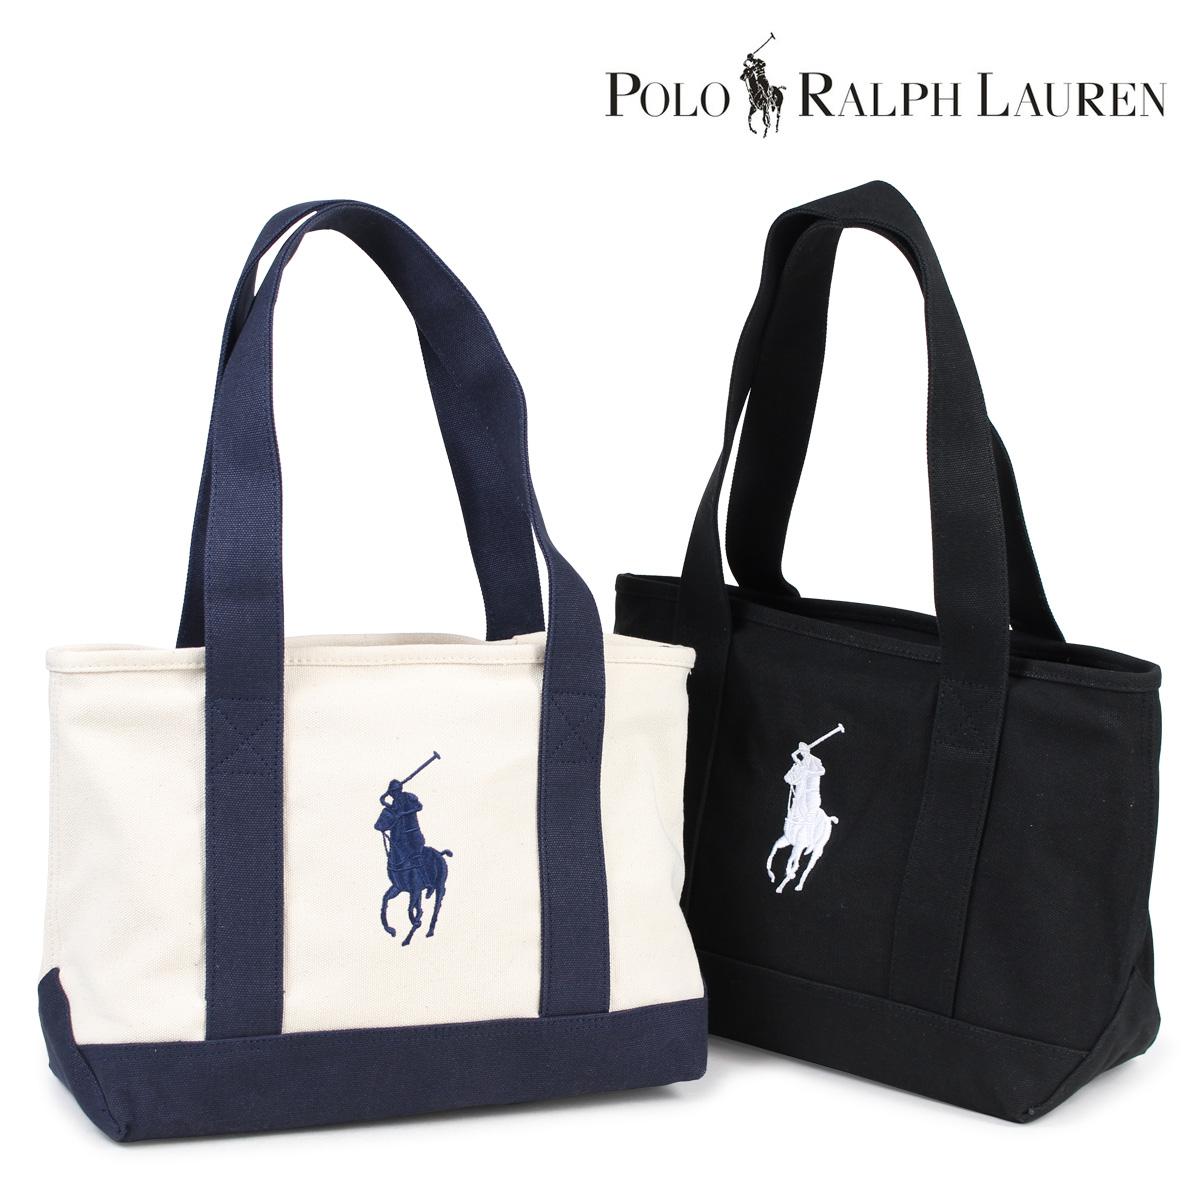 91e11ab50f SneaK Online Shop  Polo Ralph Lauren POLO RALPH LAUREN bag tote bag ...